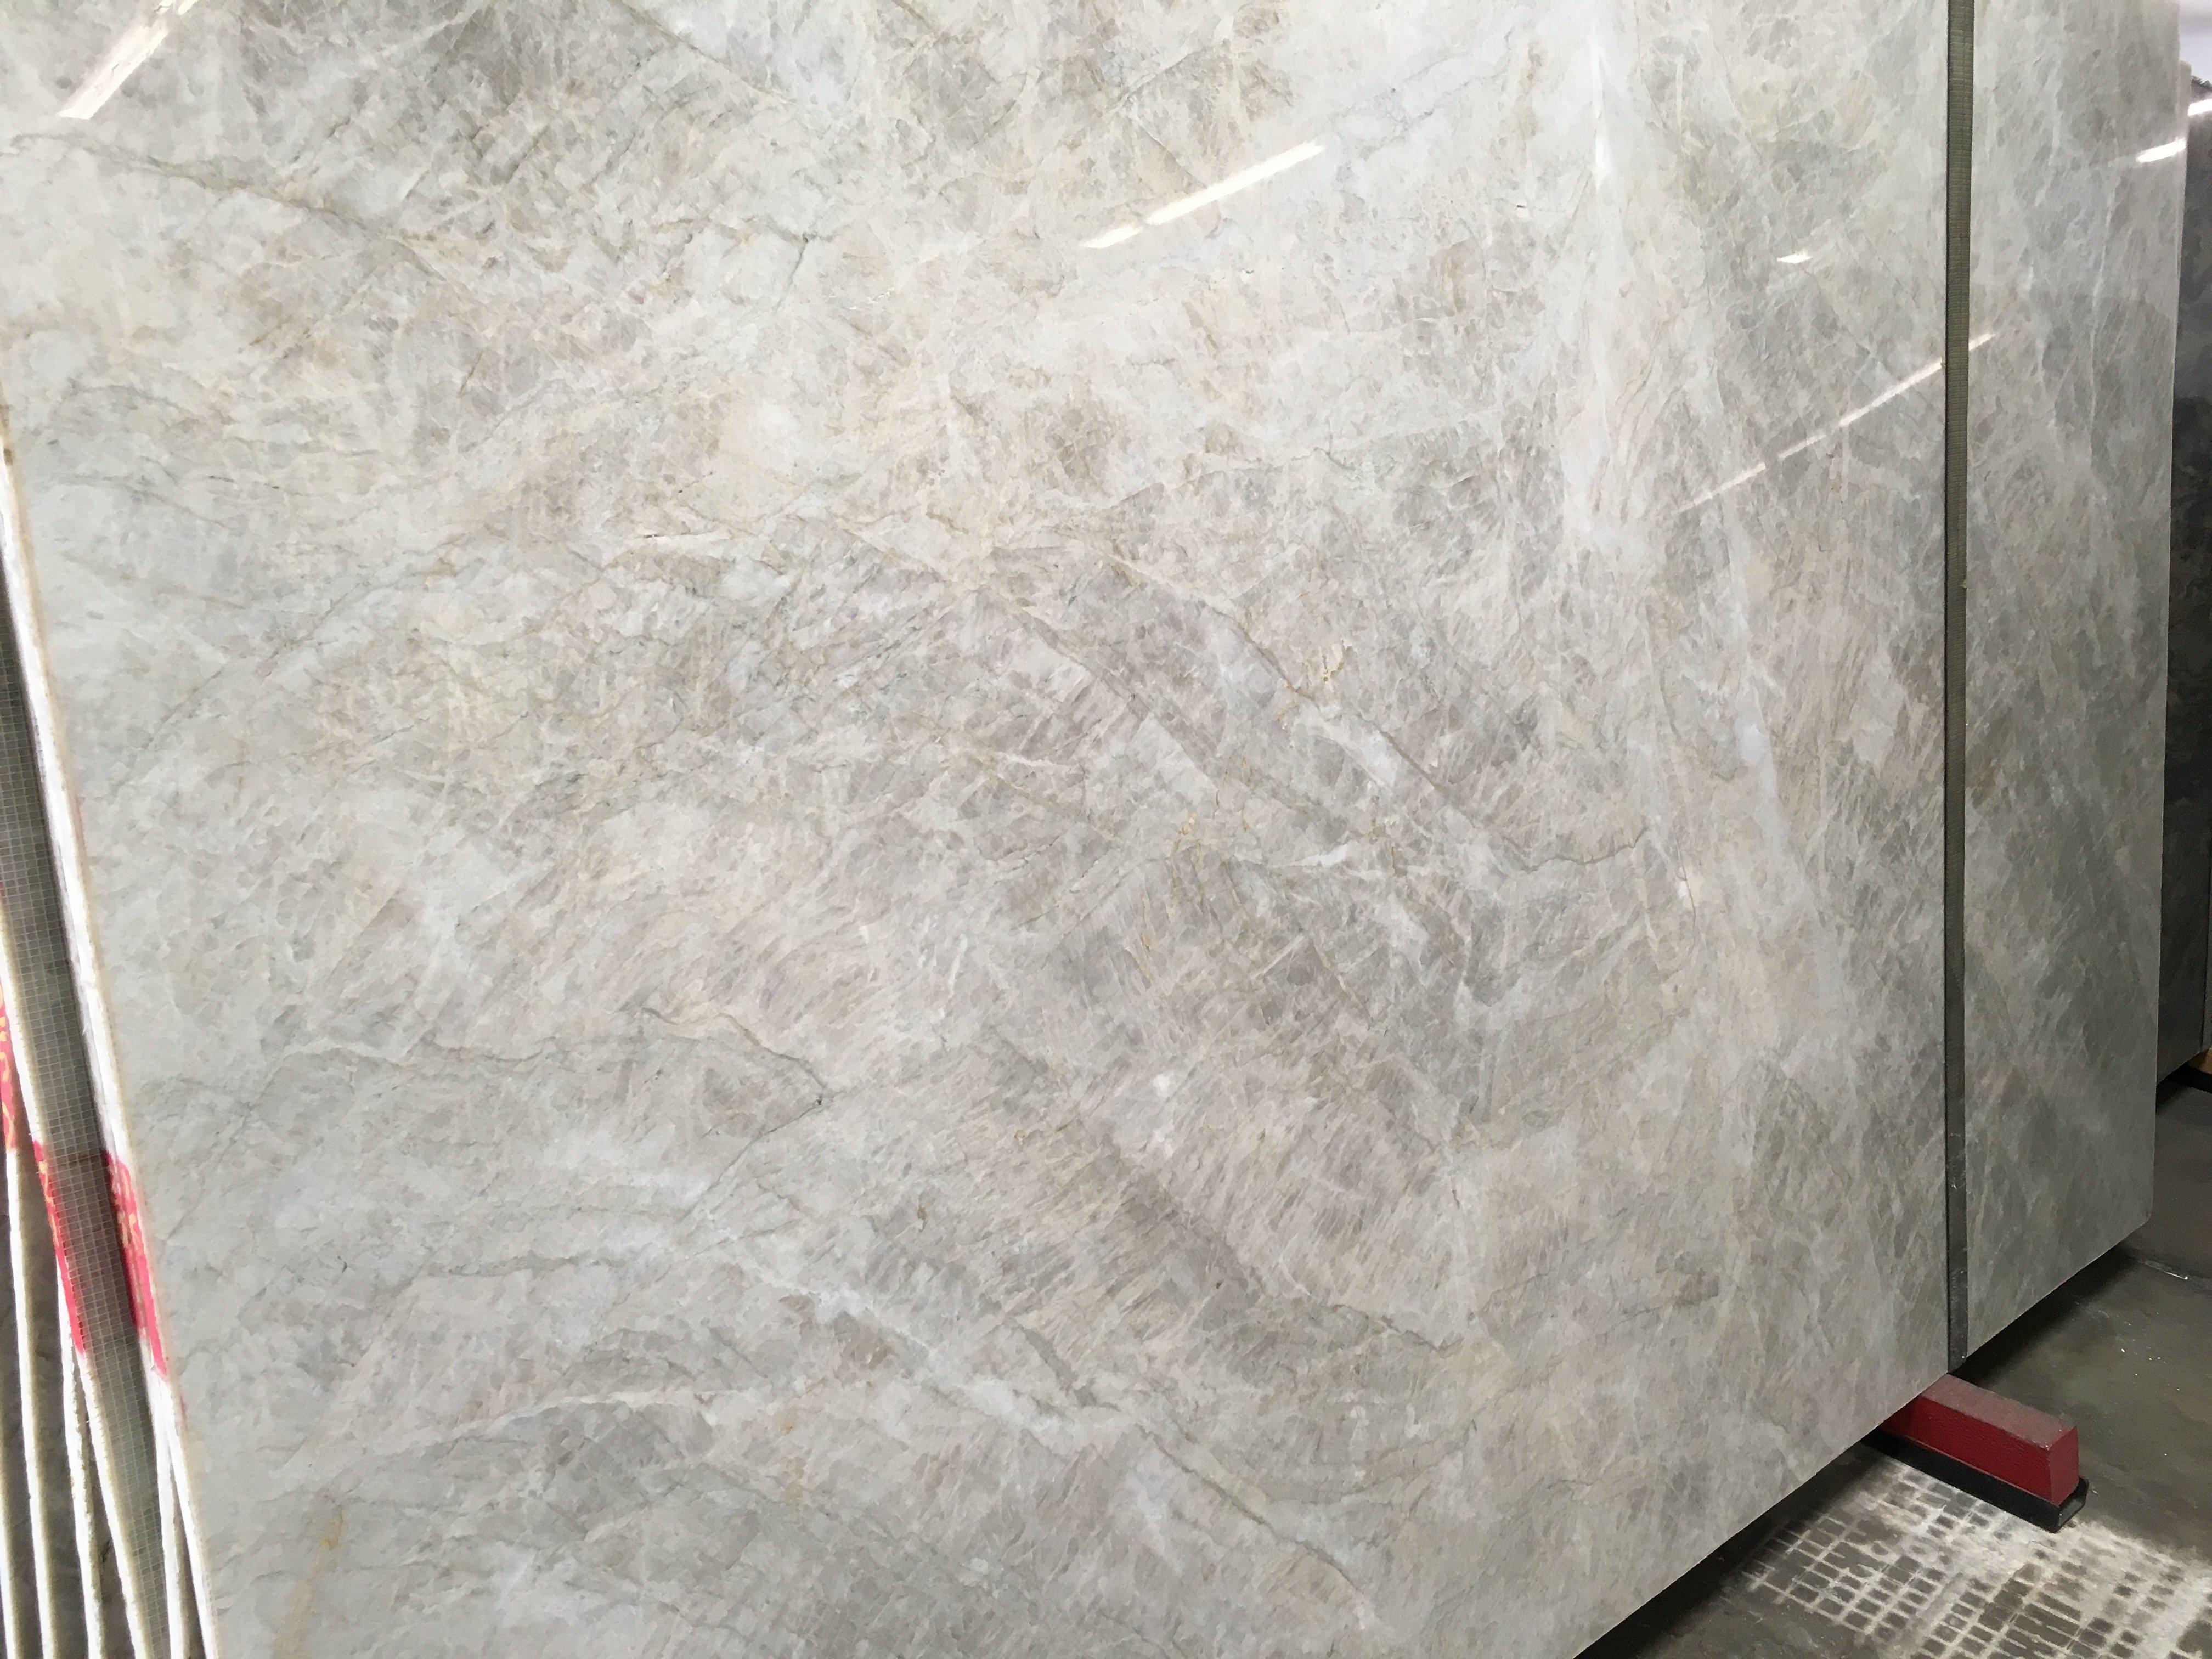 White Pearl Polished Quartzite Slab | Trendy Surfaces